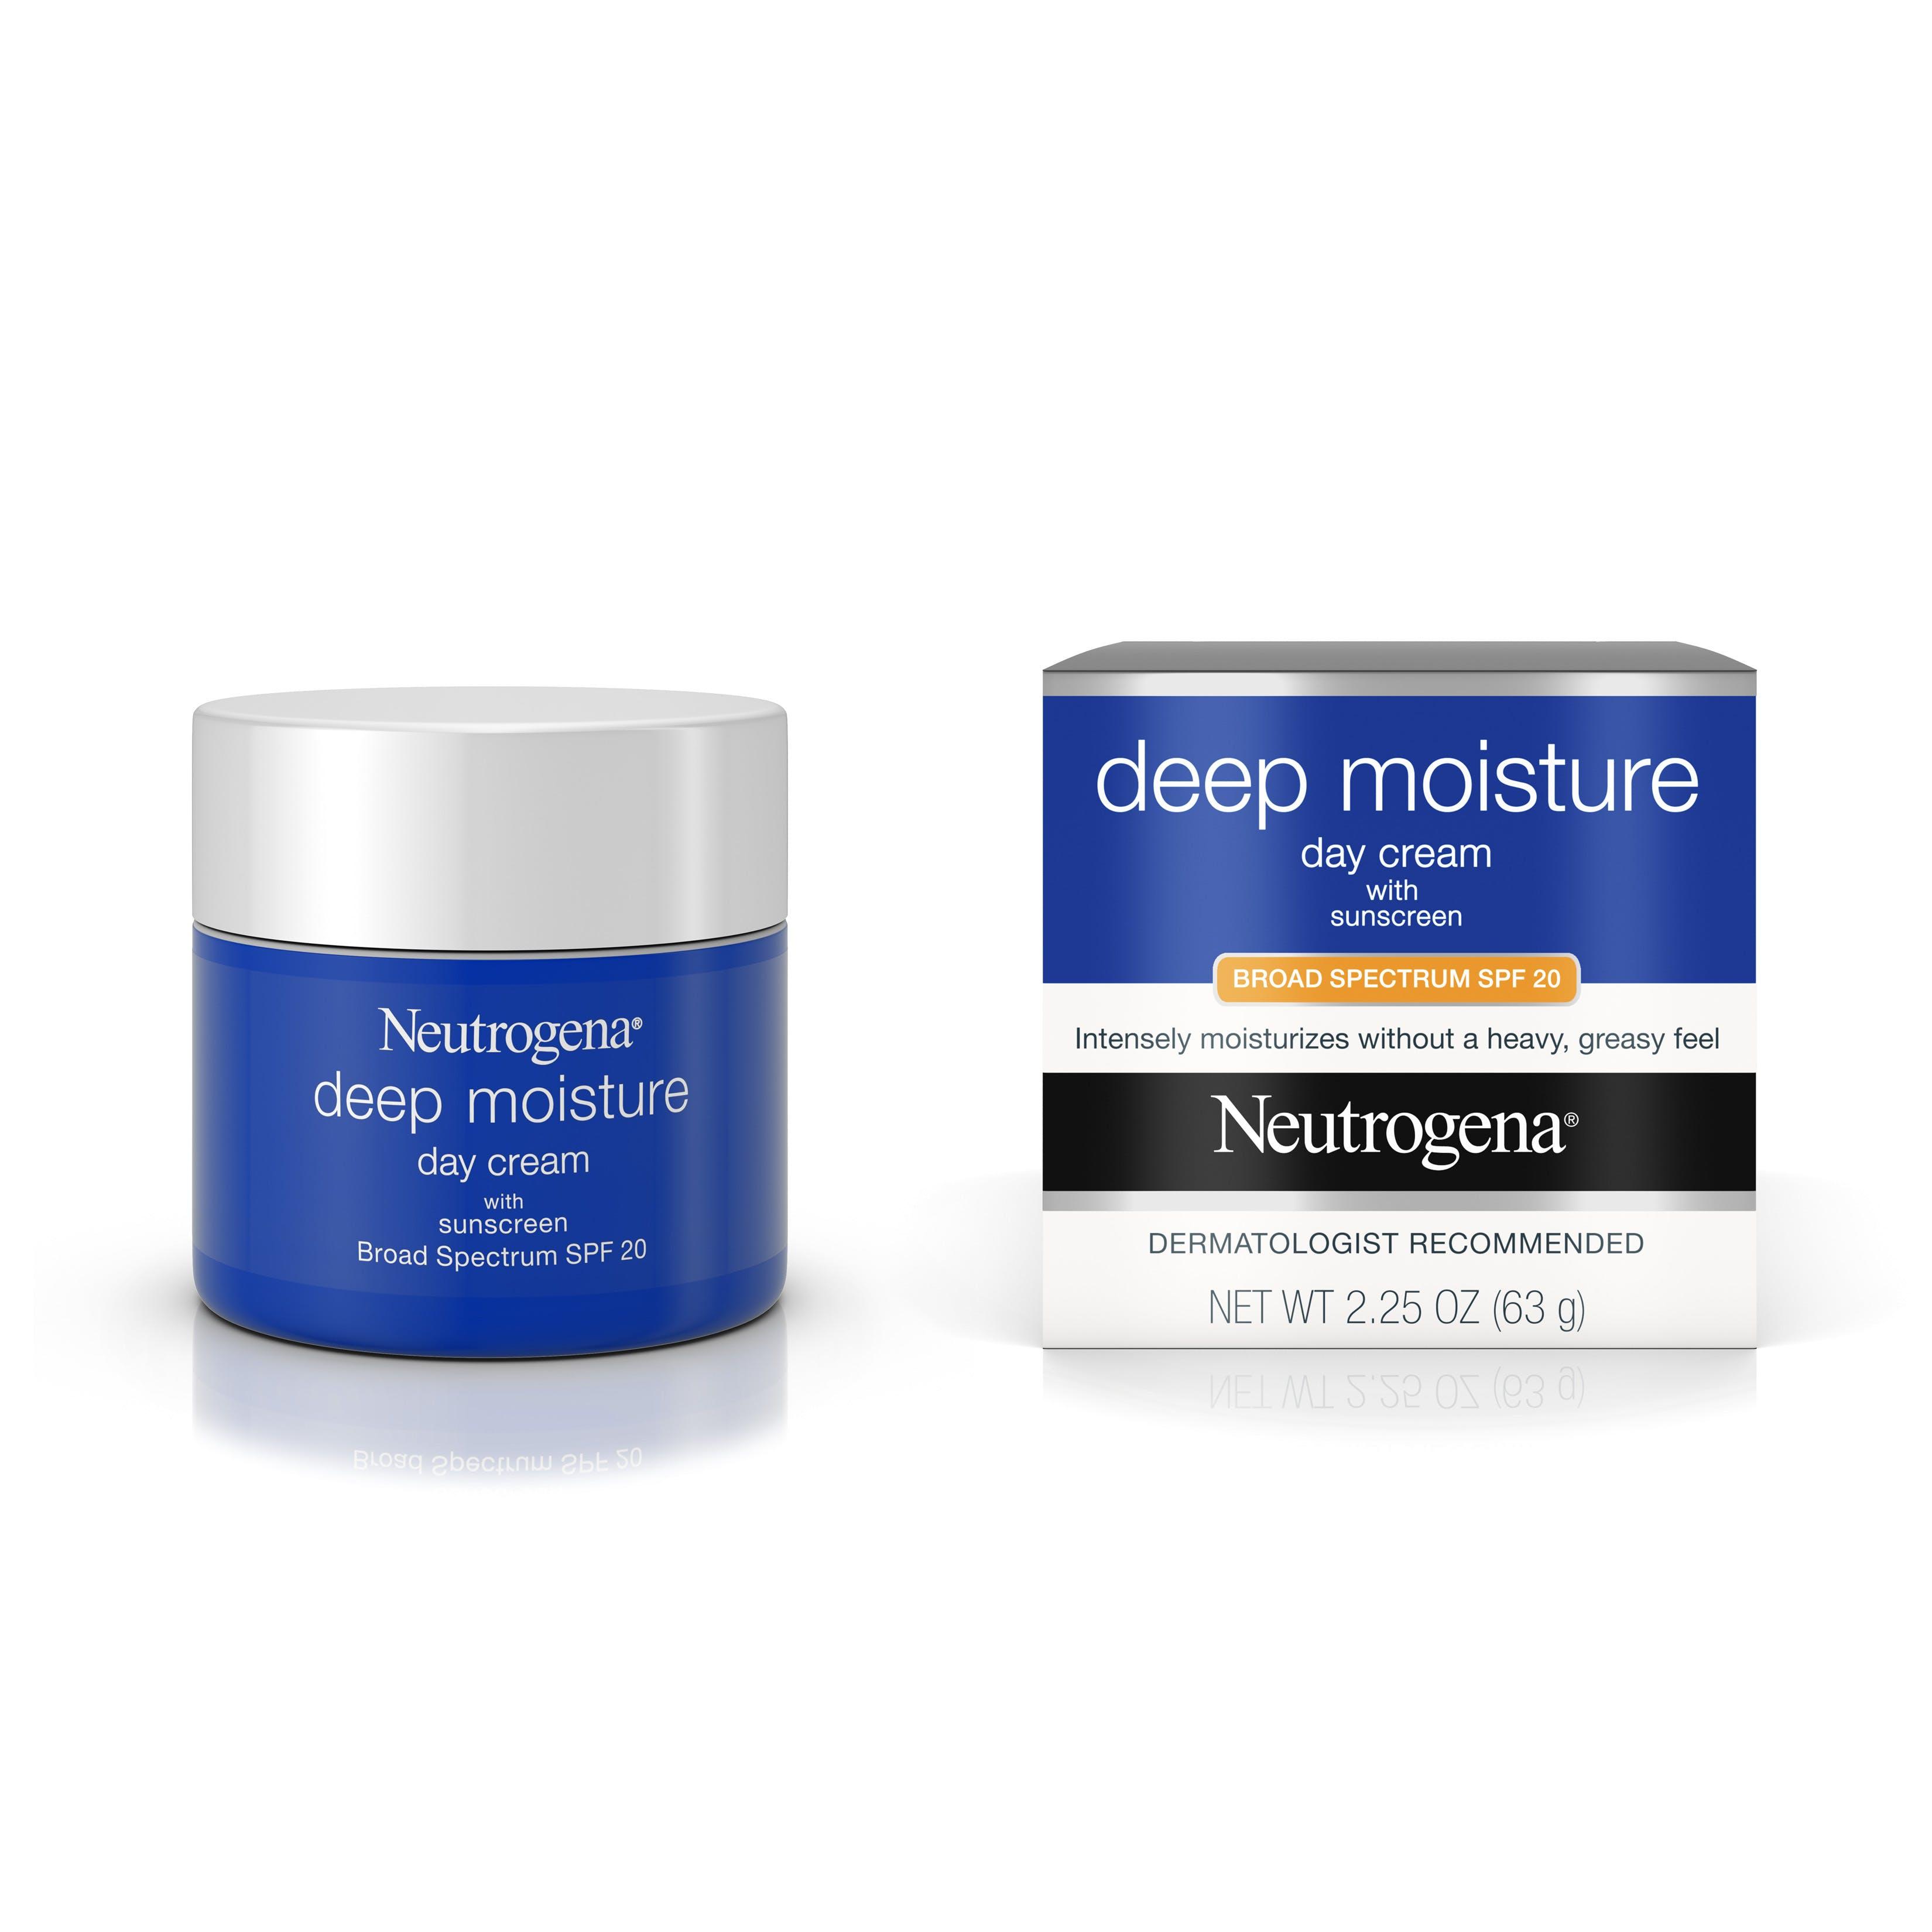 greasy moisturizer for dry skin